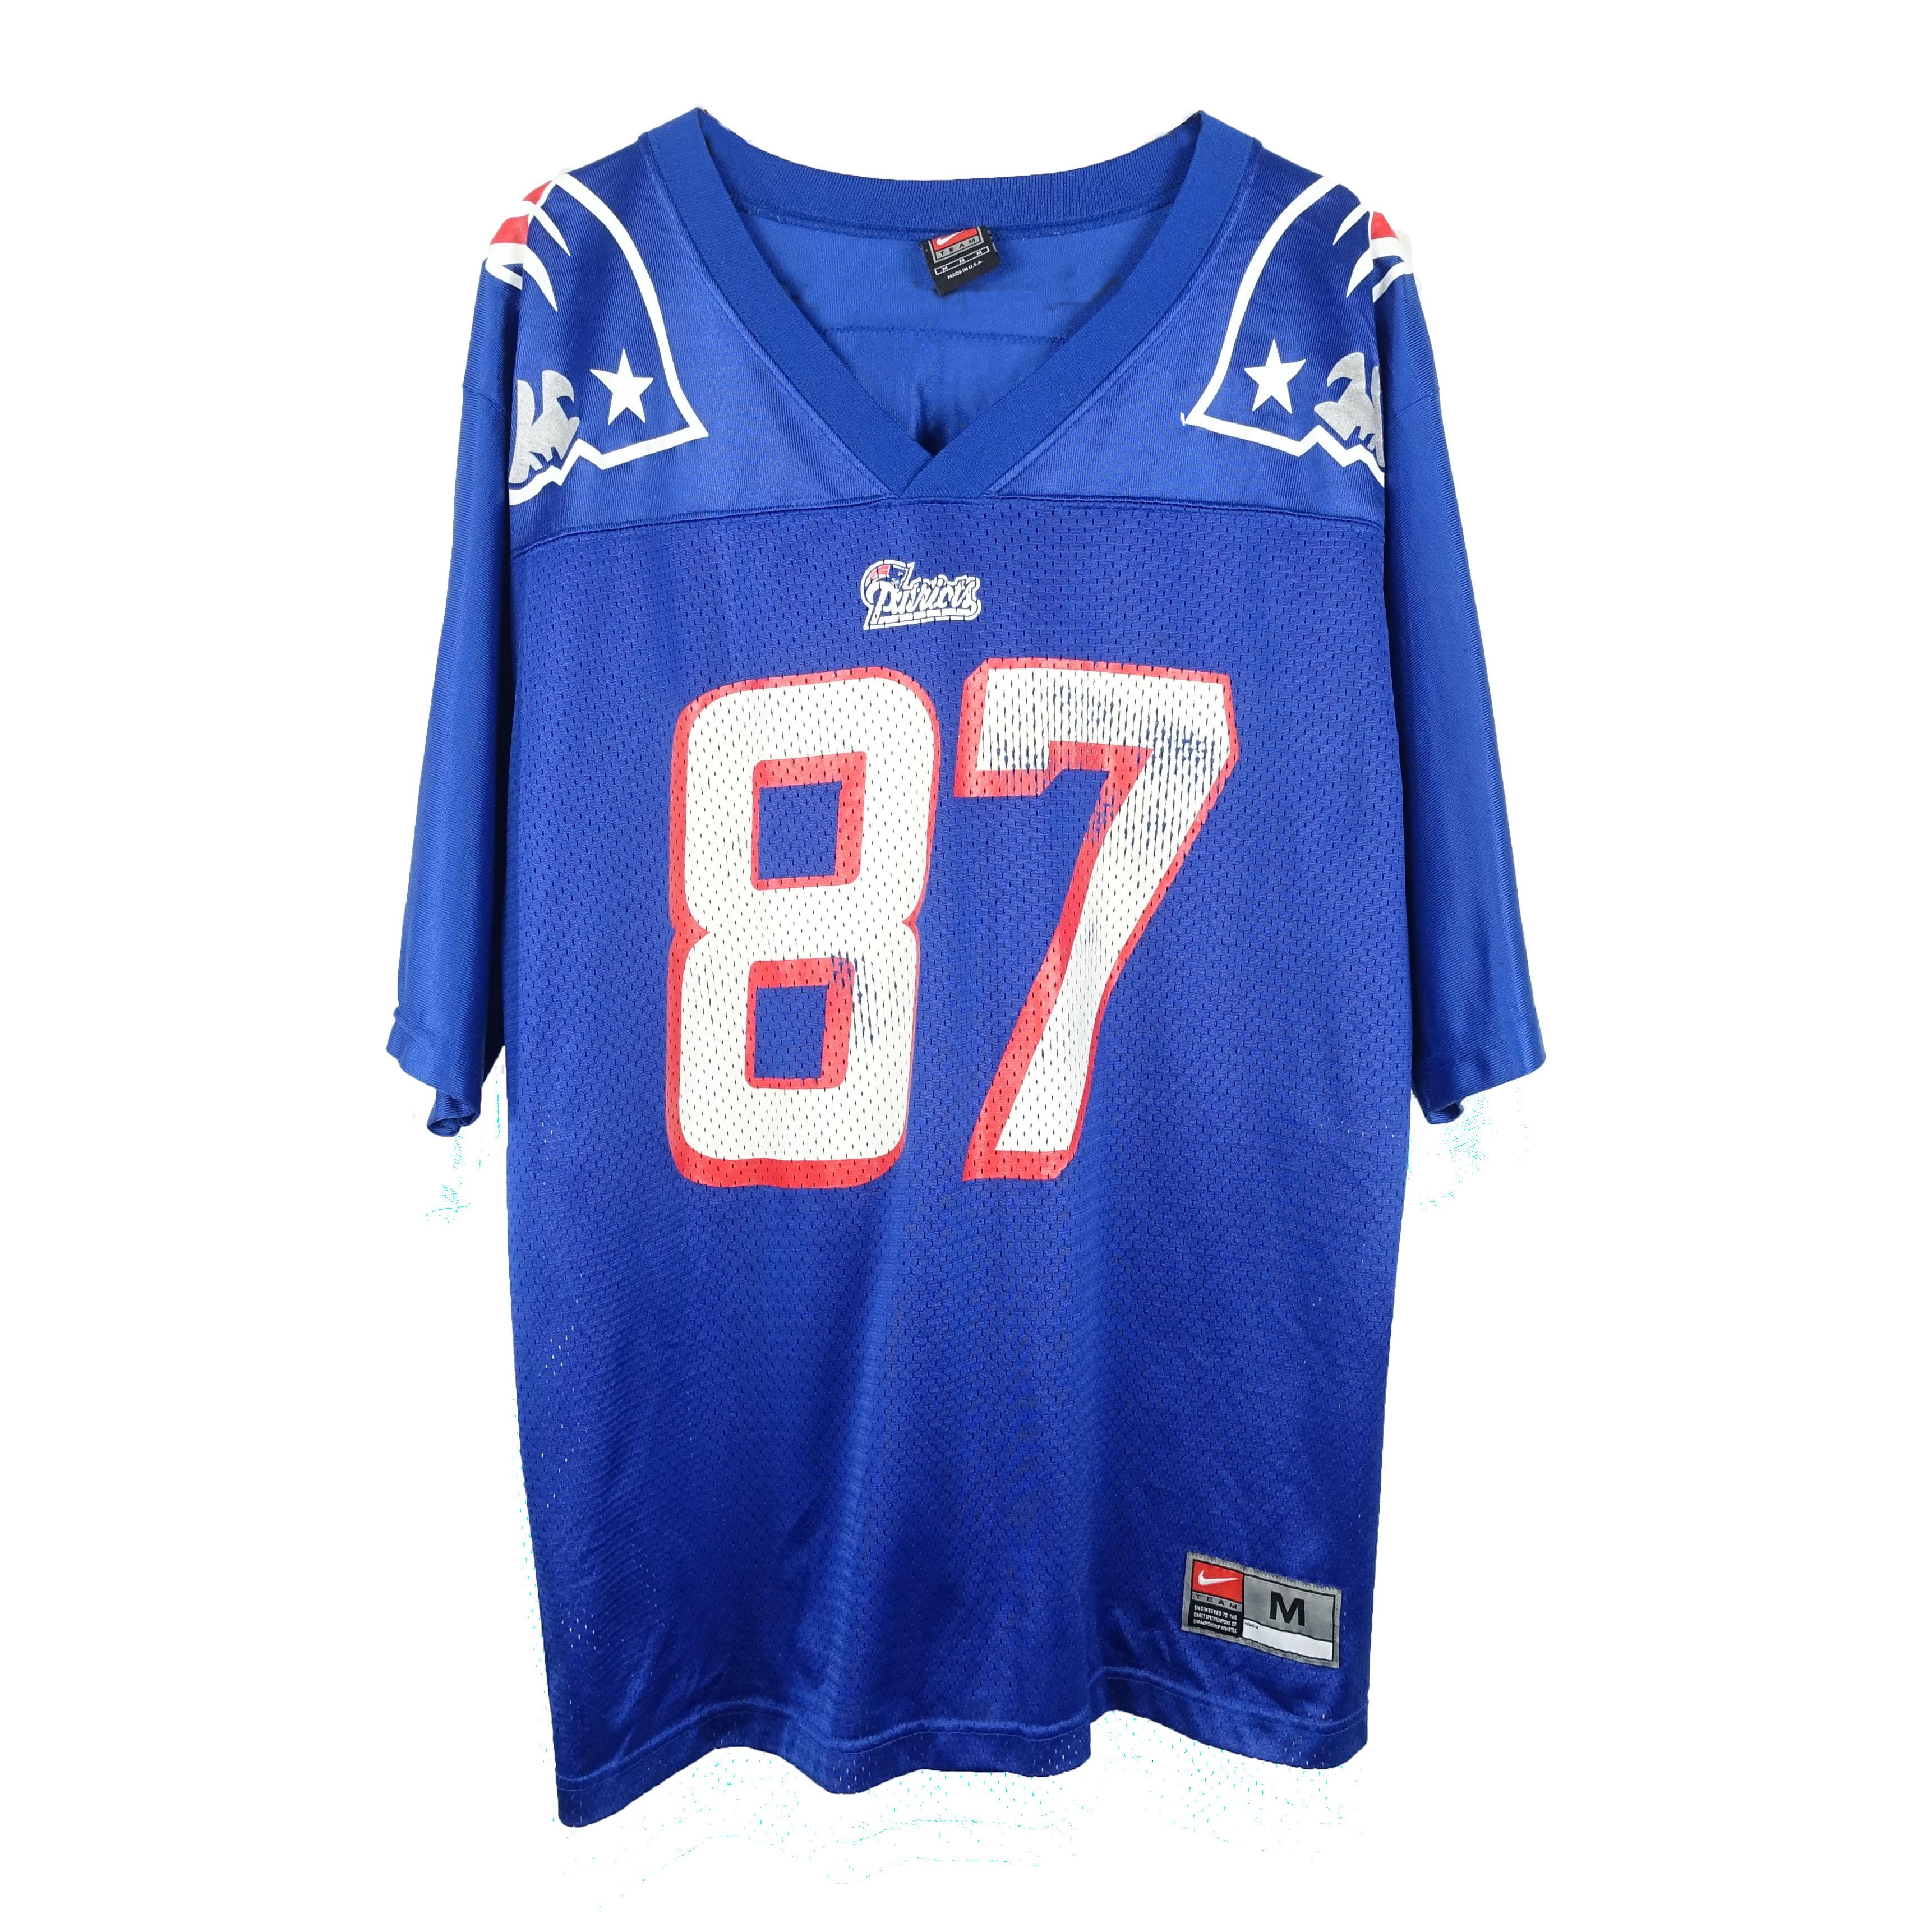 Nike 90s Nike Ben Coates #87 New England Patriots NFL Jersey